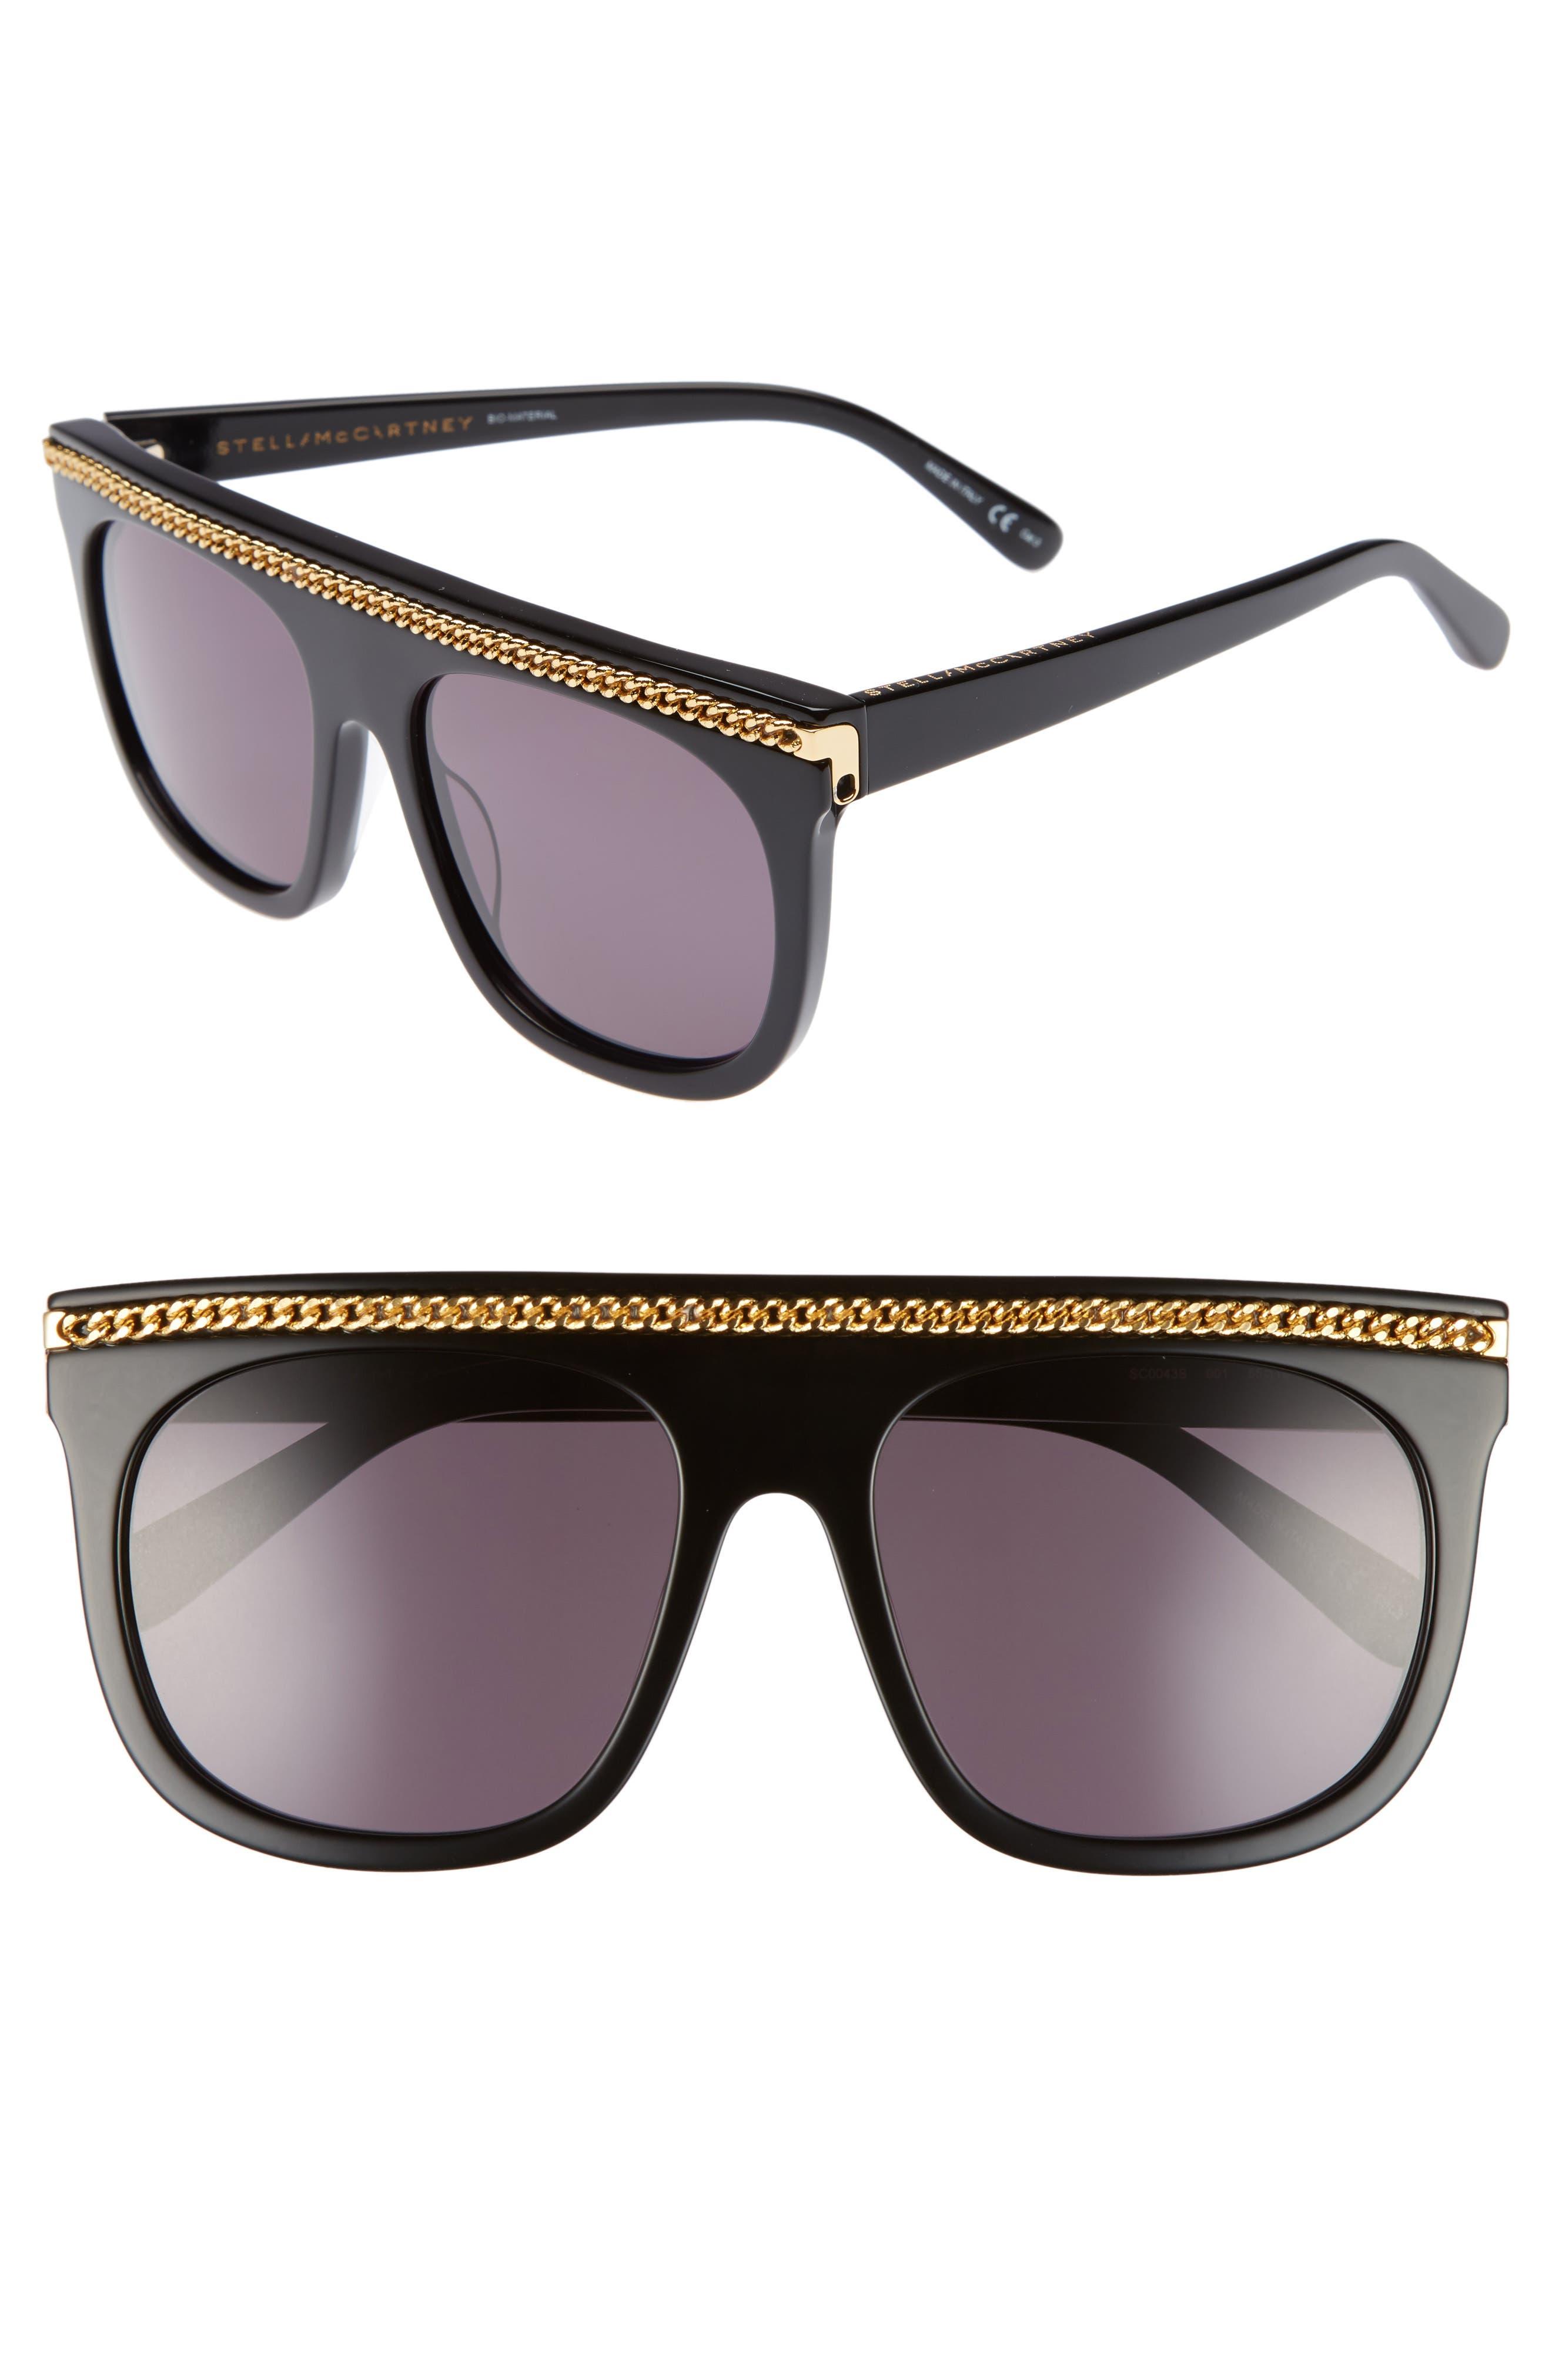 55mm Flat Top Sunglasses,                         Main,                         color, 001